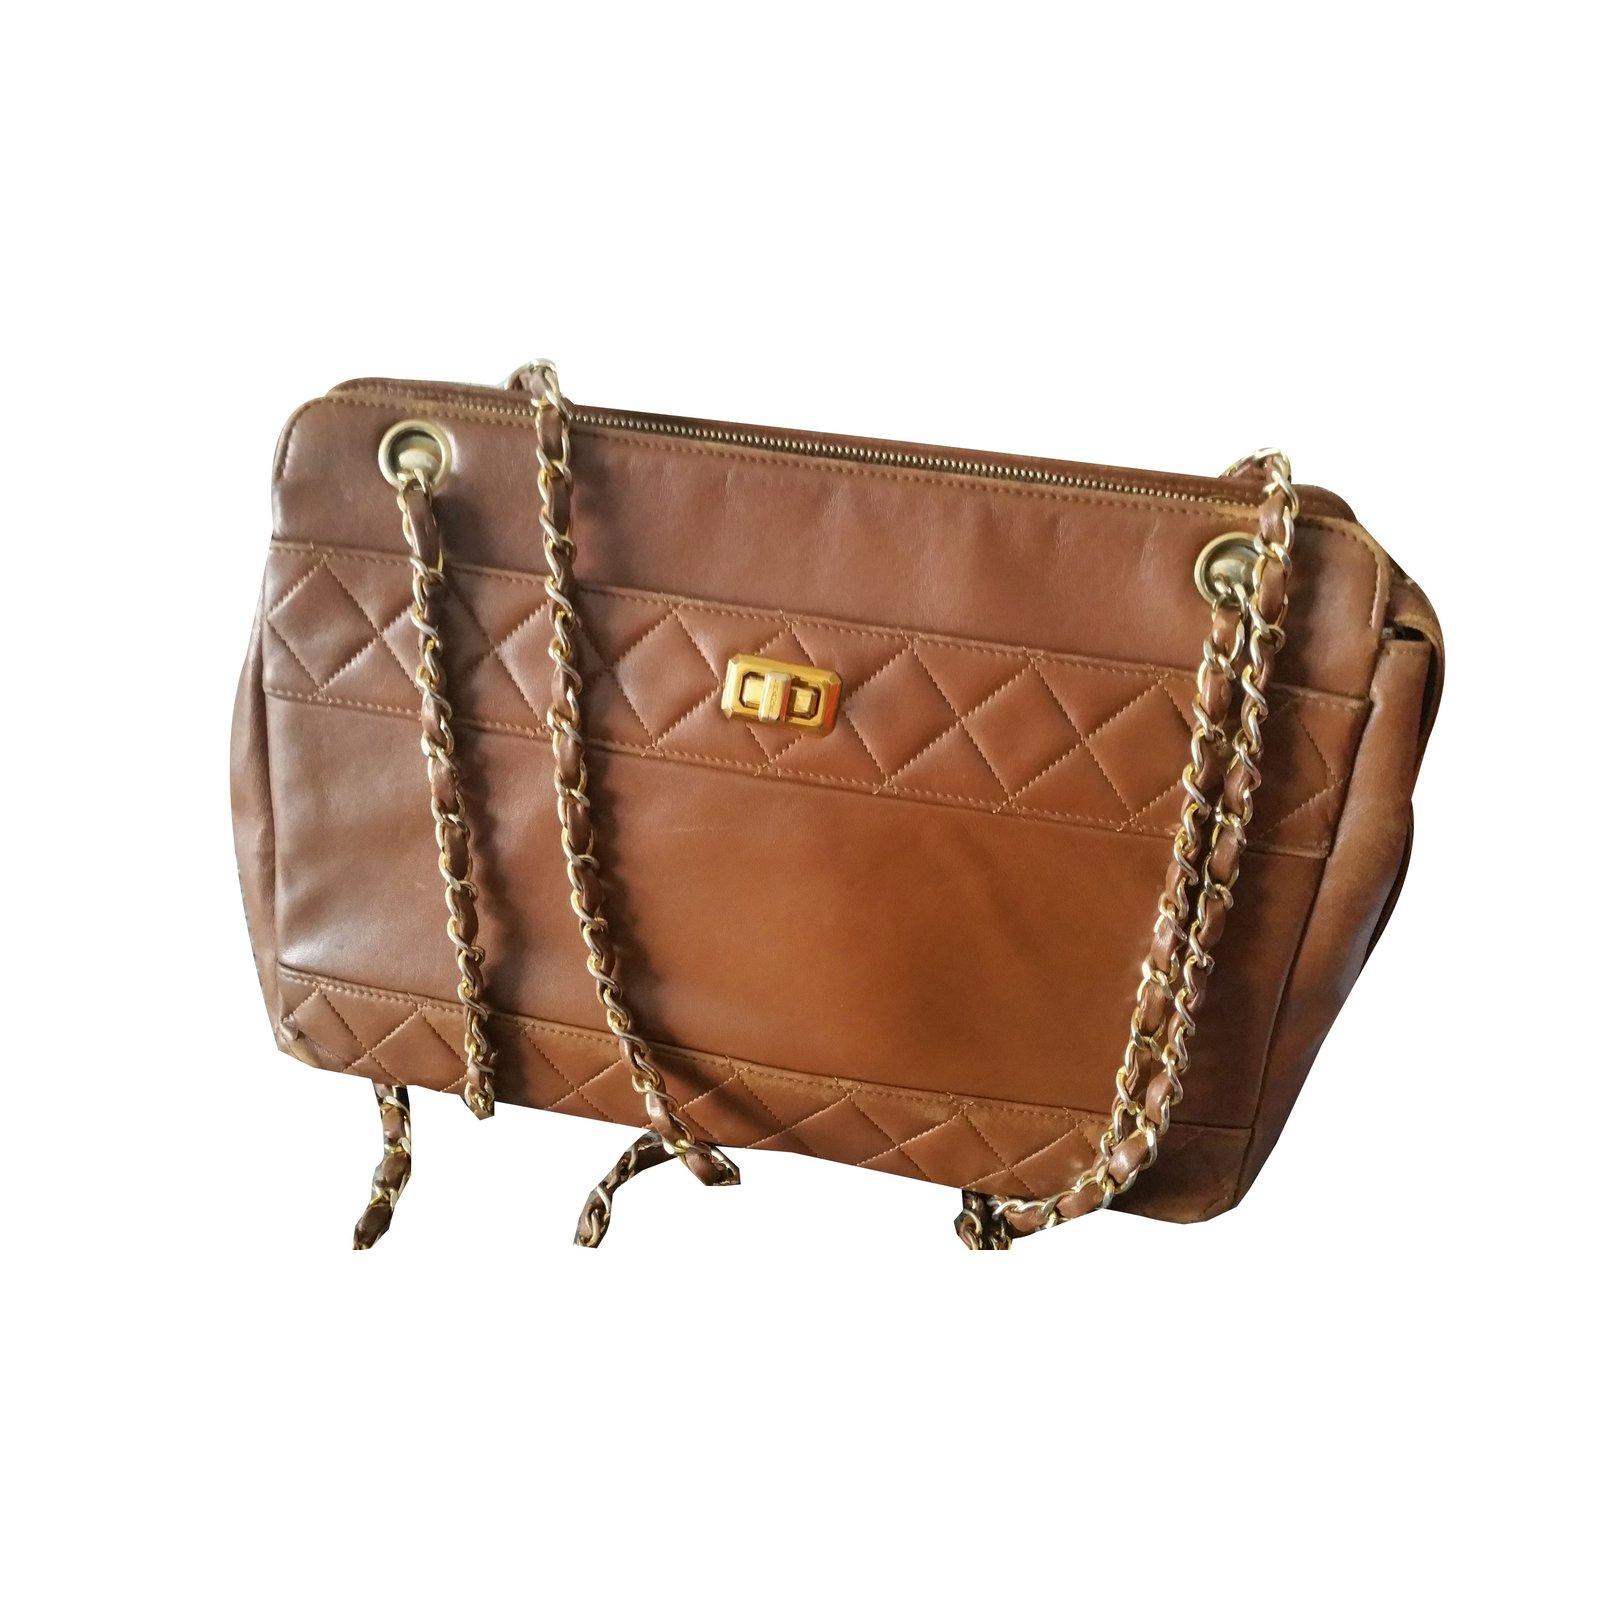 c293302b2cb9 Chanel Bag Handbags Leather Caramel ref.75248 - Joli Closet